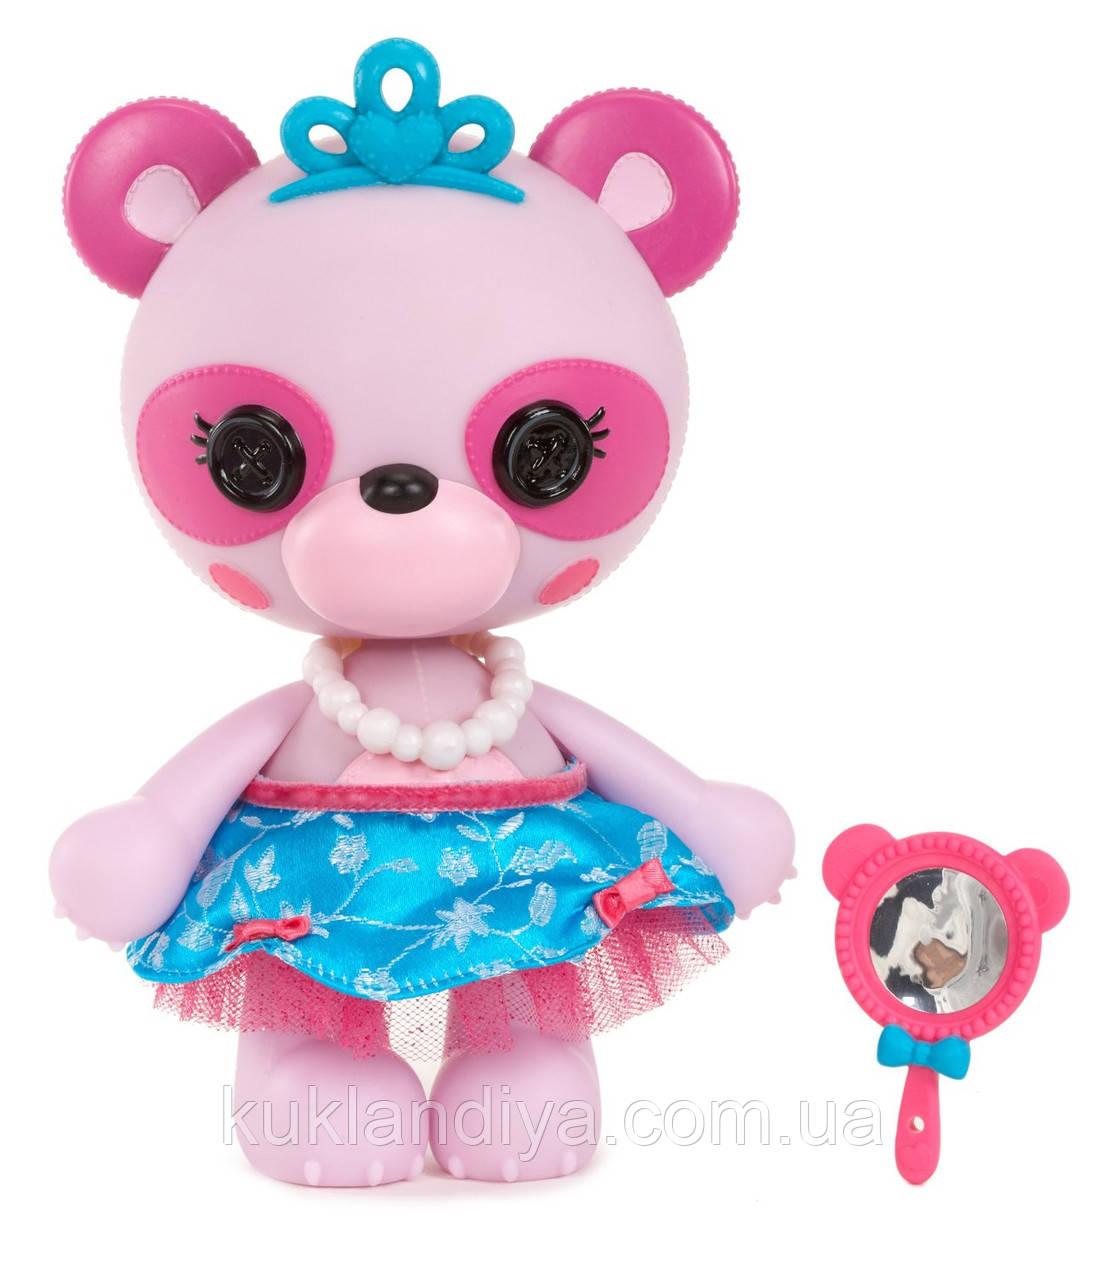 Lalaloopsy Pet Pals Doll- Pandy Chomps-A-Lot Питомец Панда